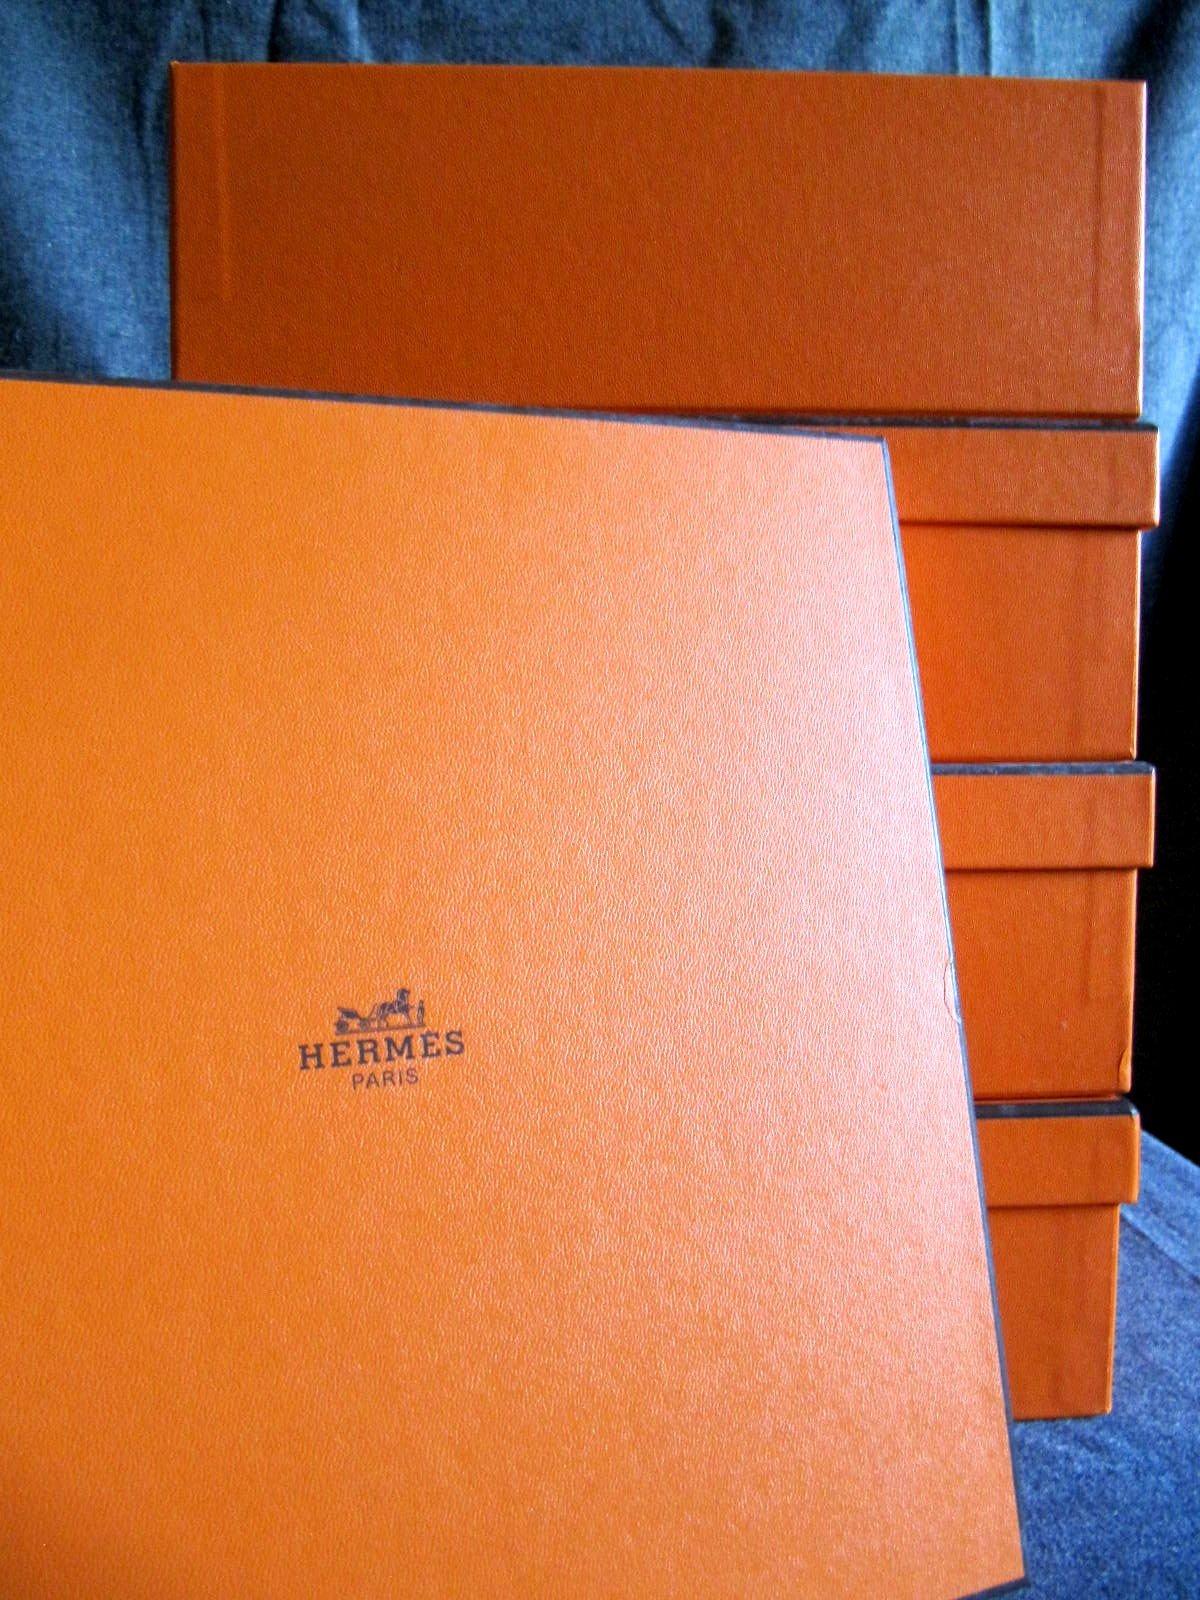 vendu lot de 4 bo tes herm s carr es identiques mes collections ordo ab chao. Black Bedroom Furniture Sets. Home Design Ideas